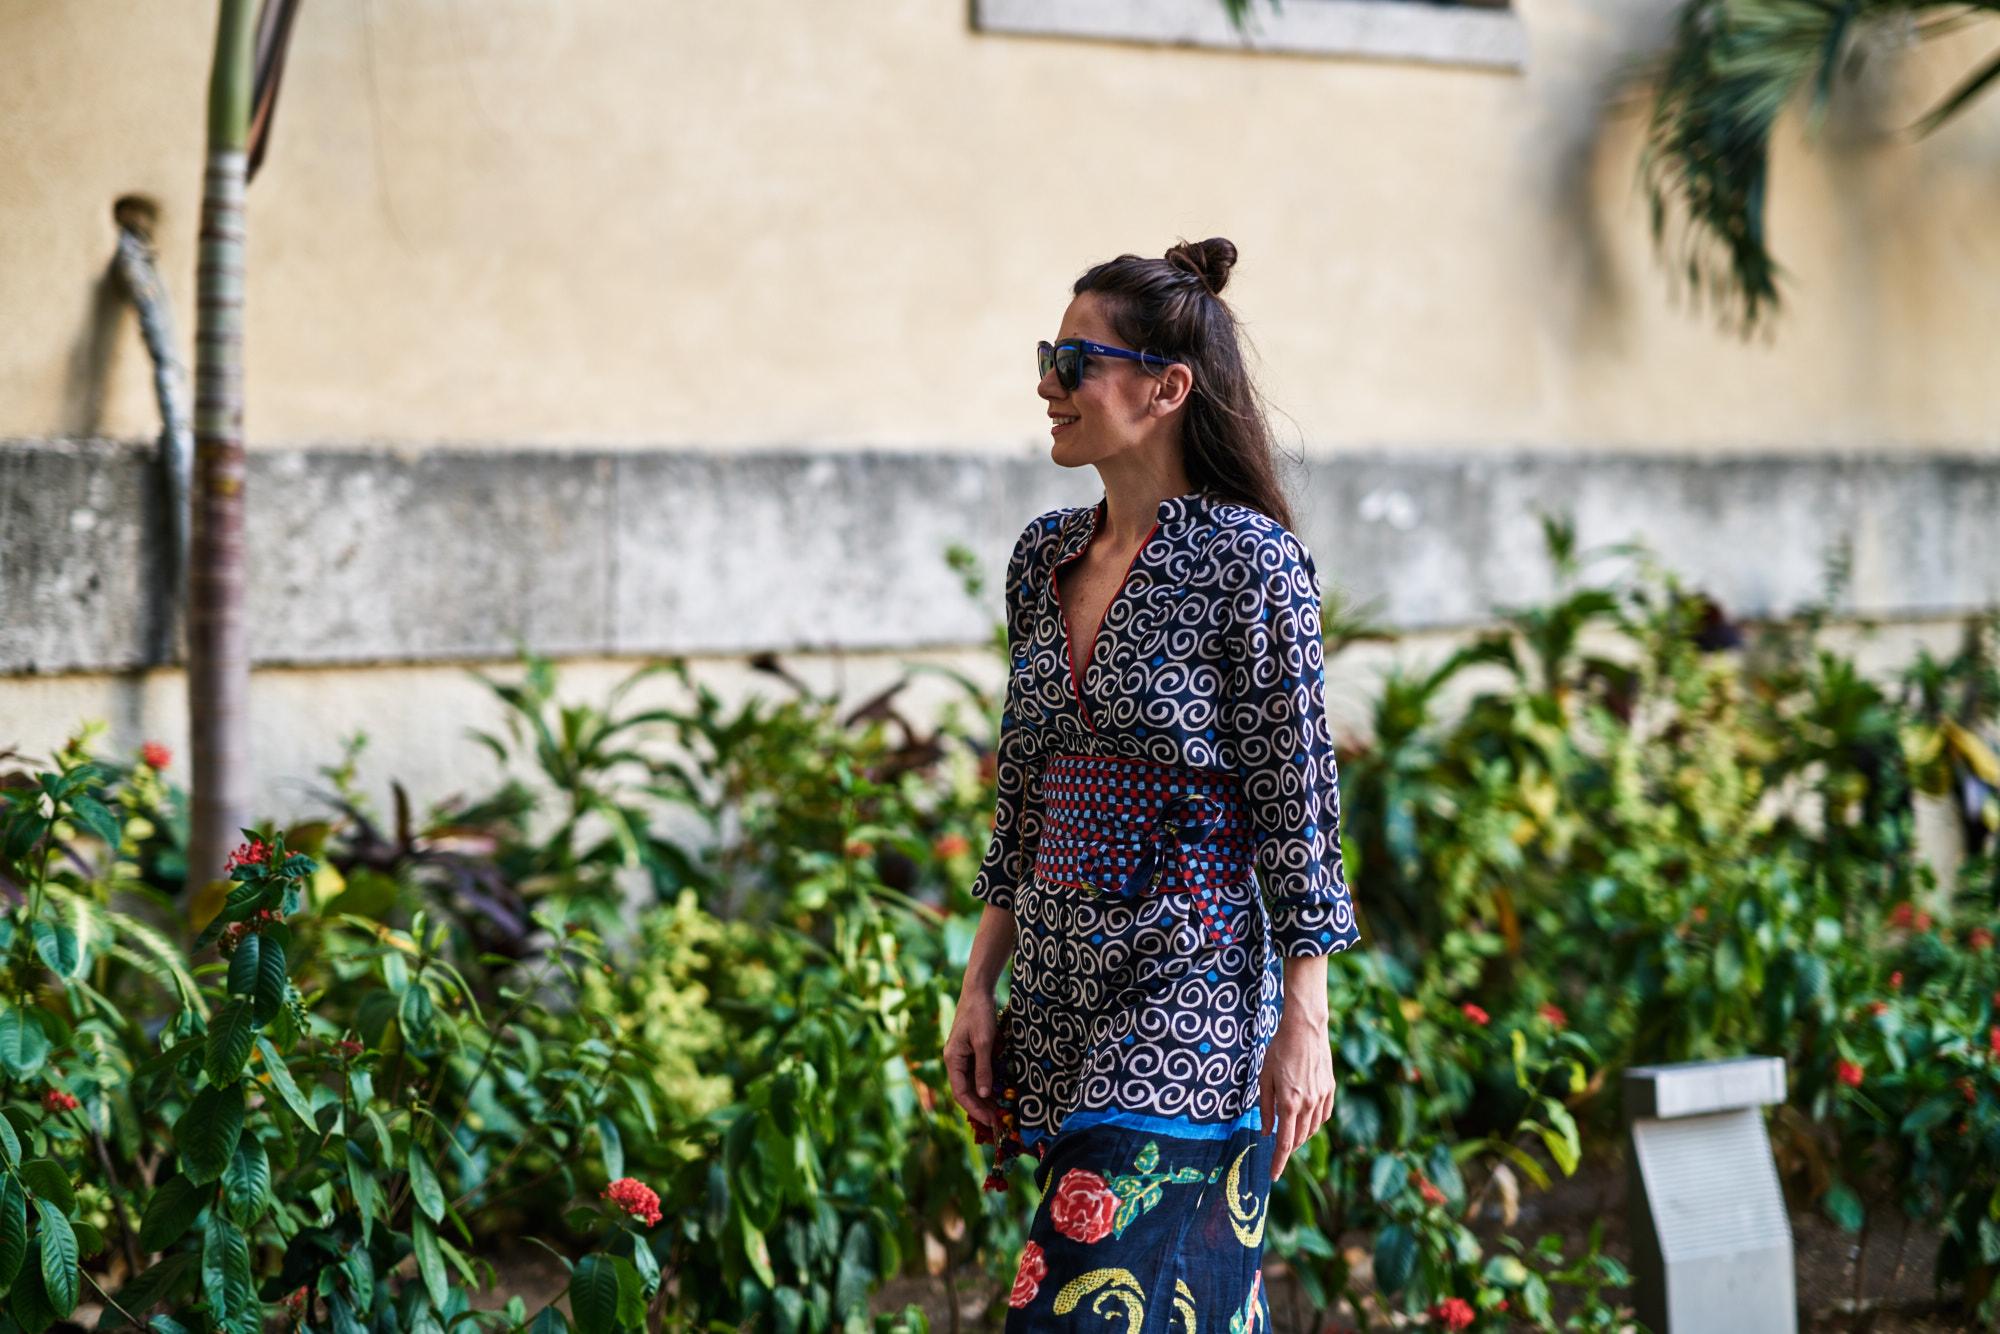 billur saatci, offnegiysem, street style, turkish style blogger, lisa corti, beachwear, cuba, küba, billurcubadiary,  offnereyegitsem